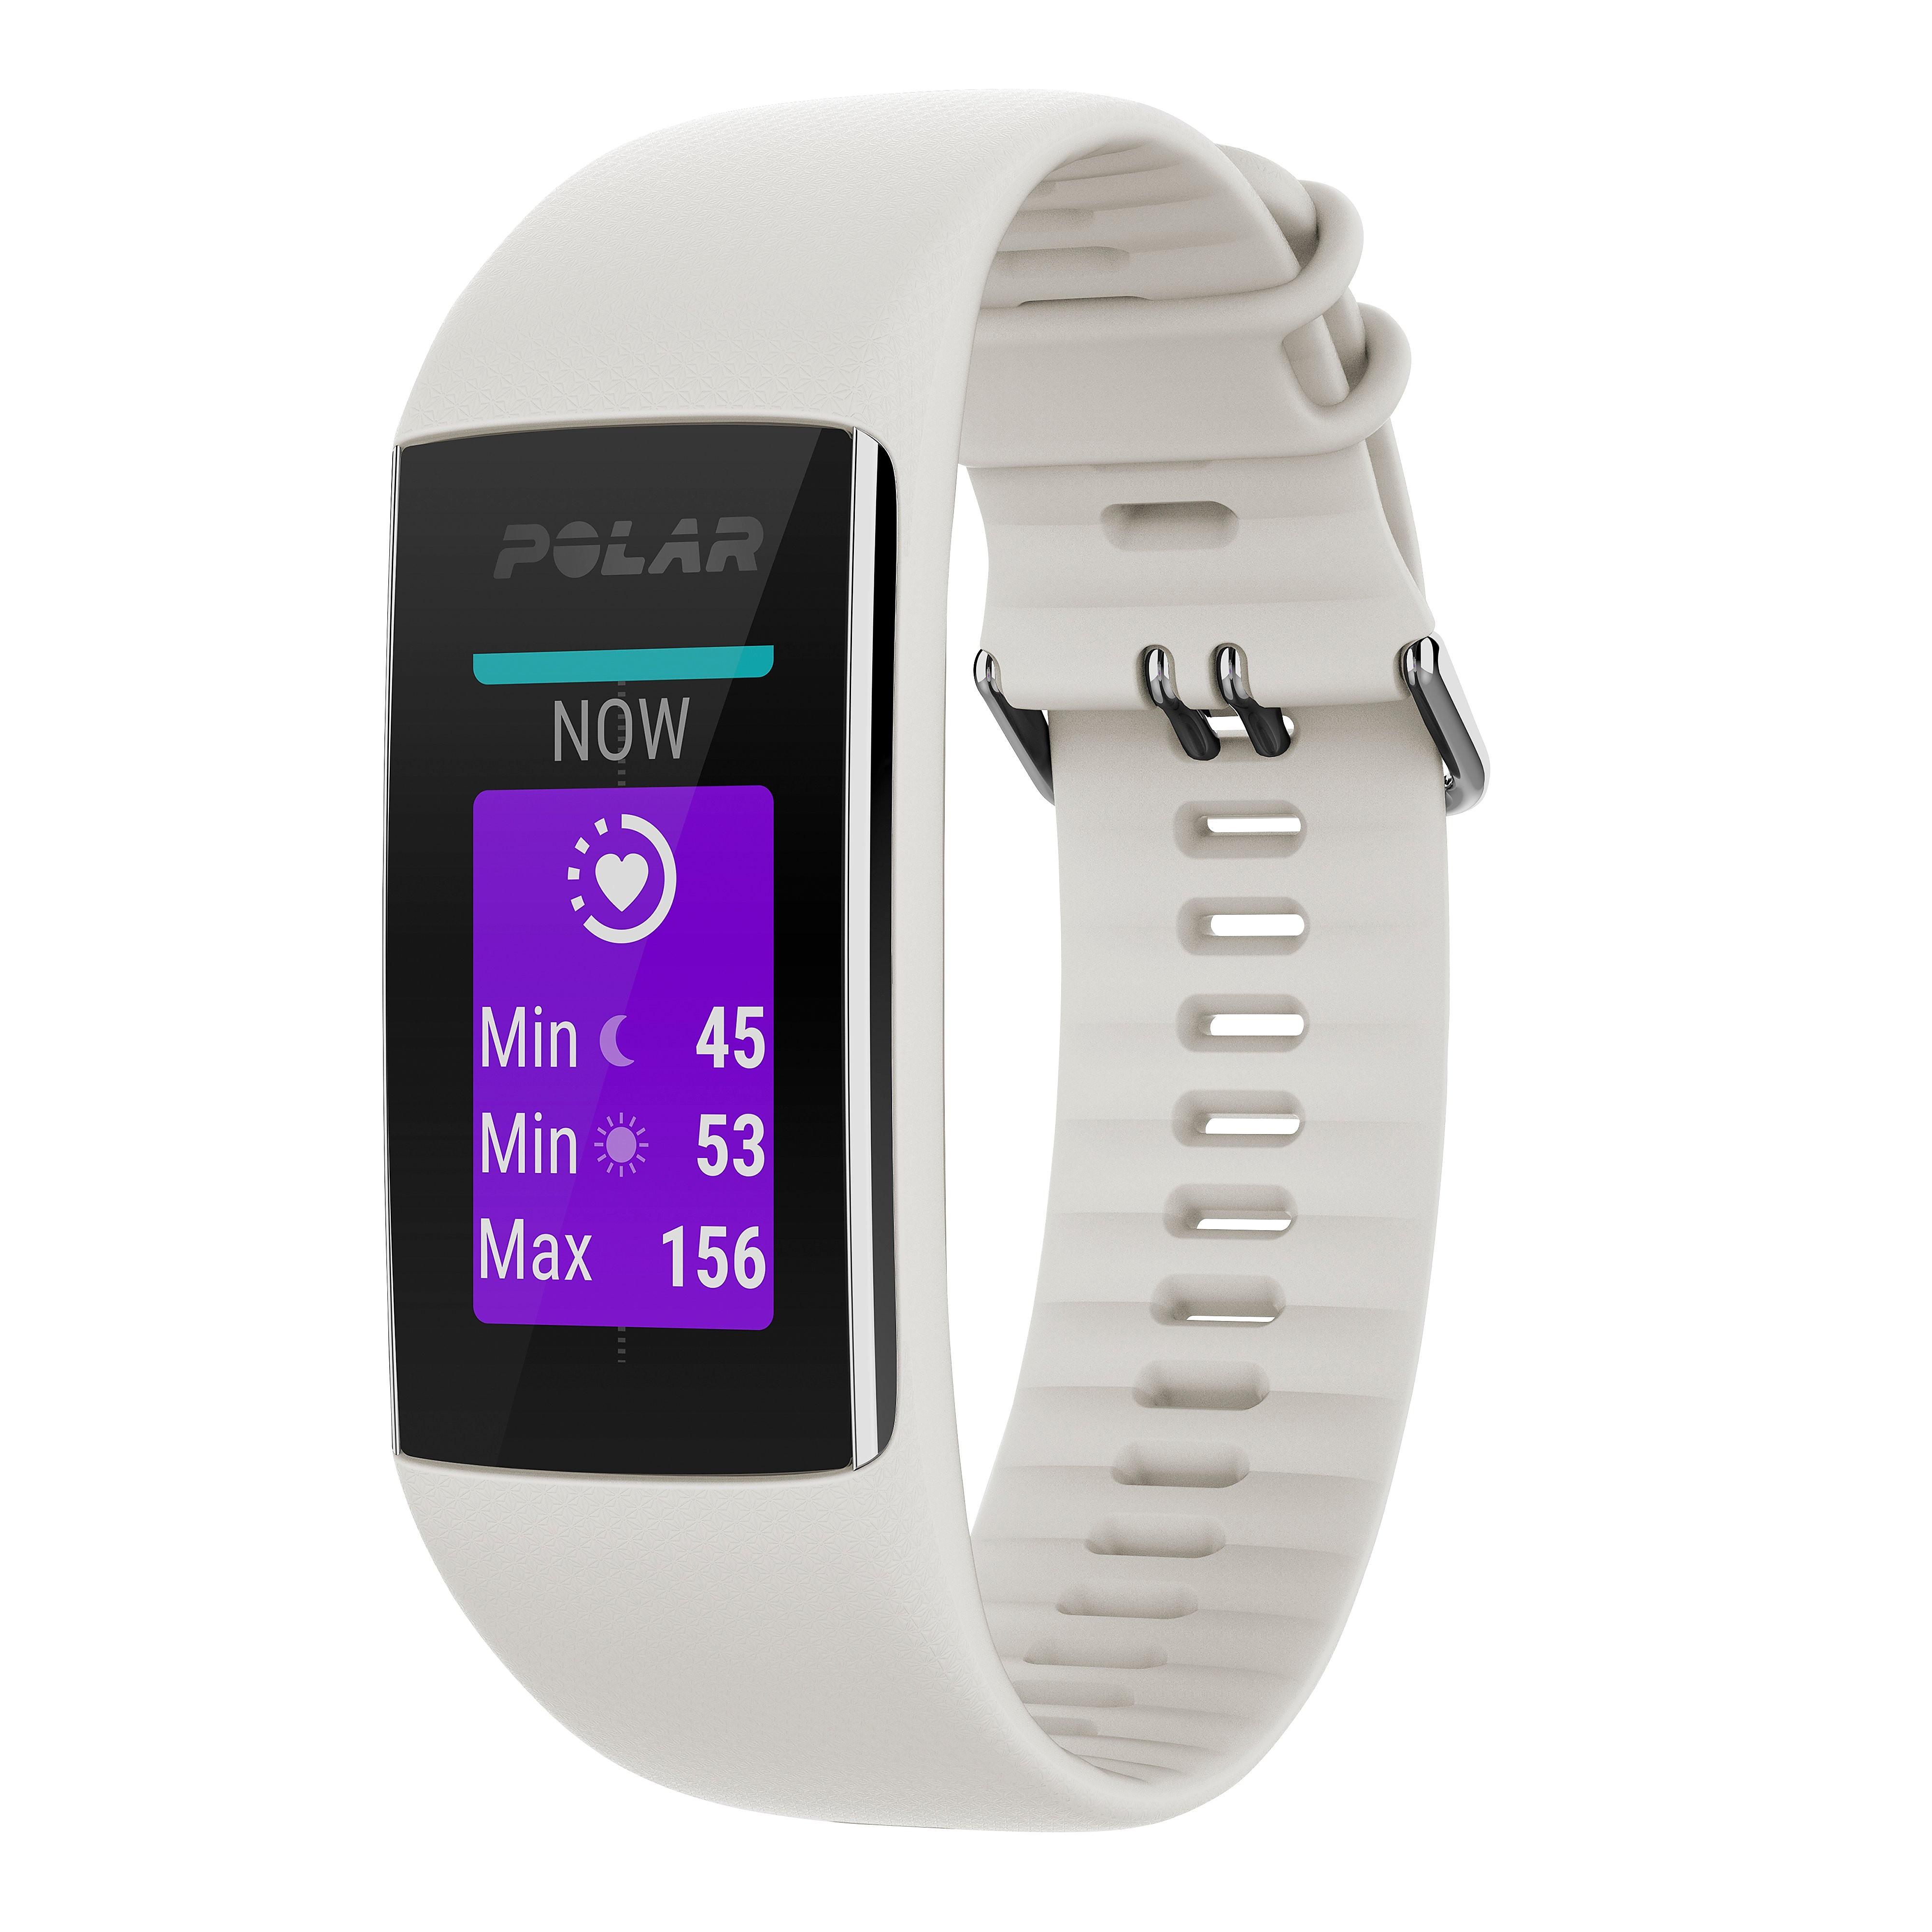 Polar Waterproof Heart Rate Monitor